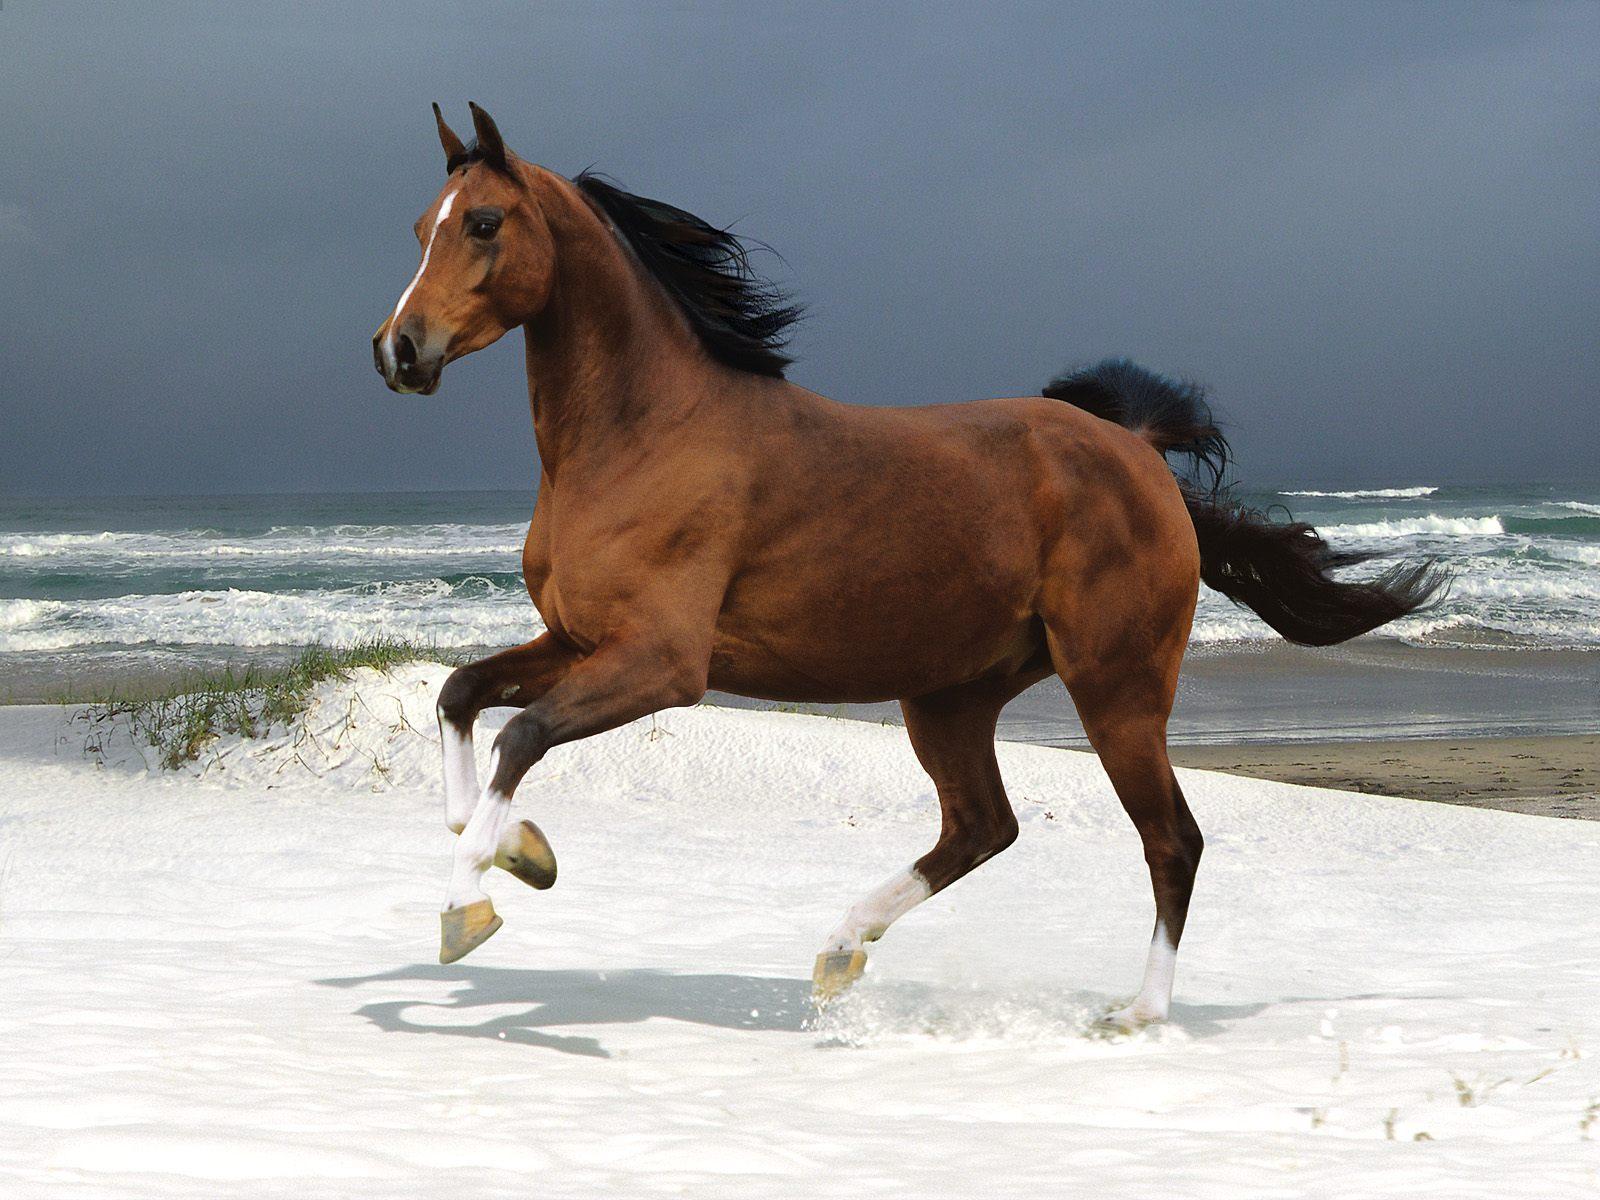 brown horse running | free desktop wallpapers for widescreen, hd